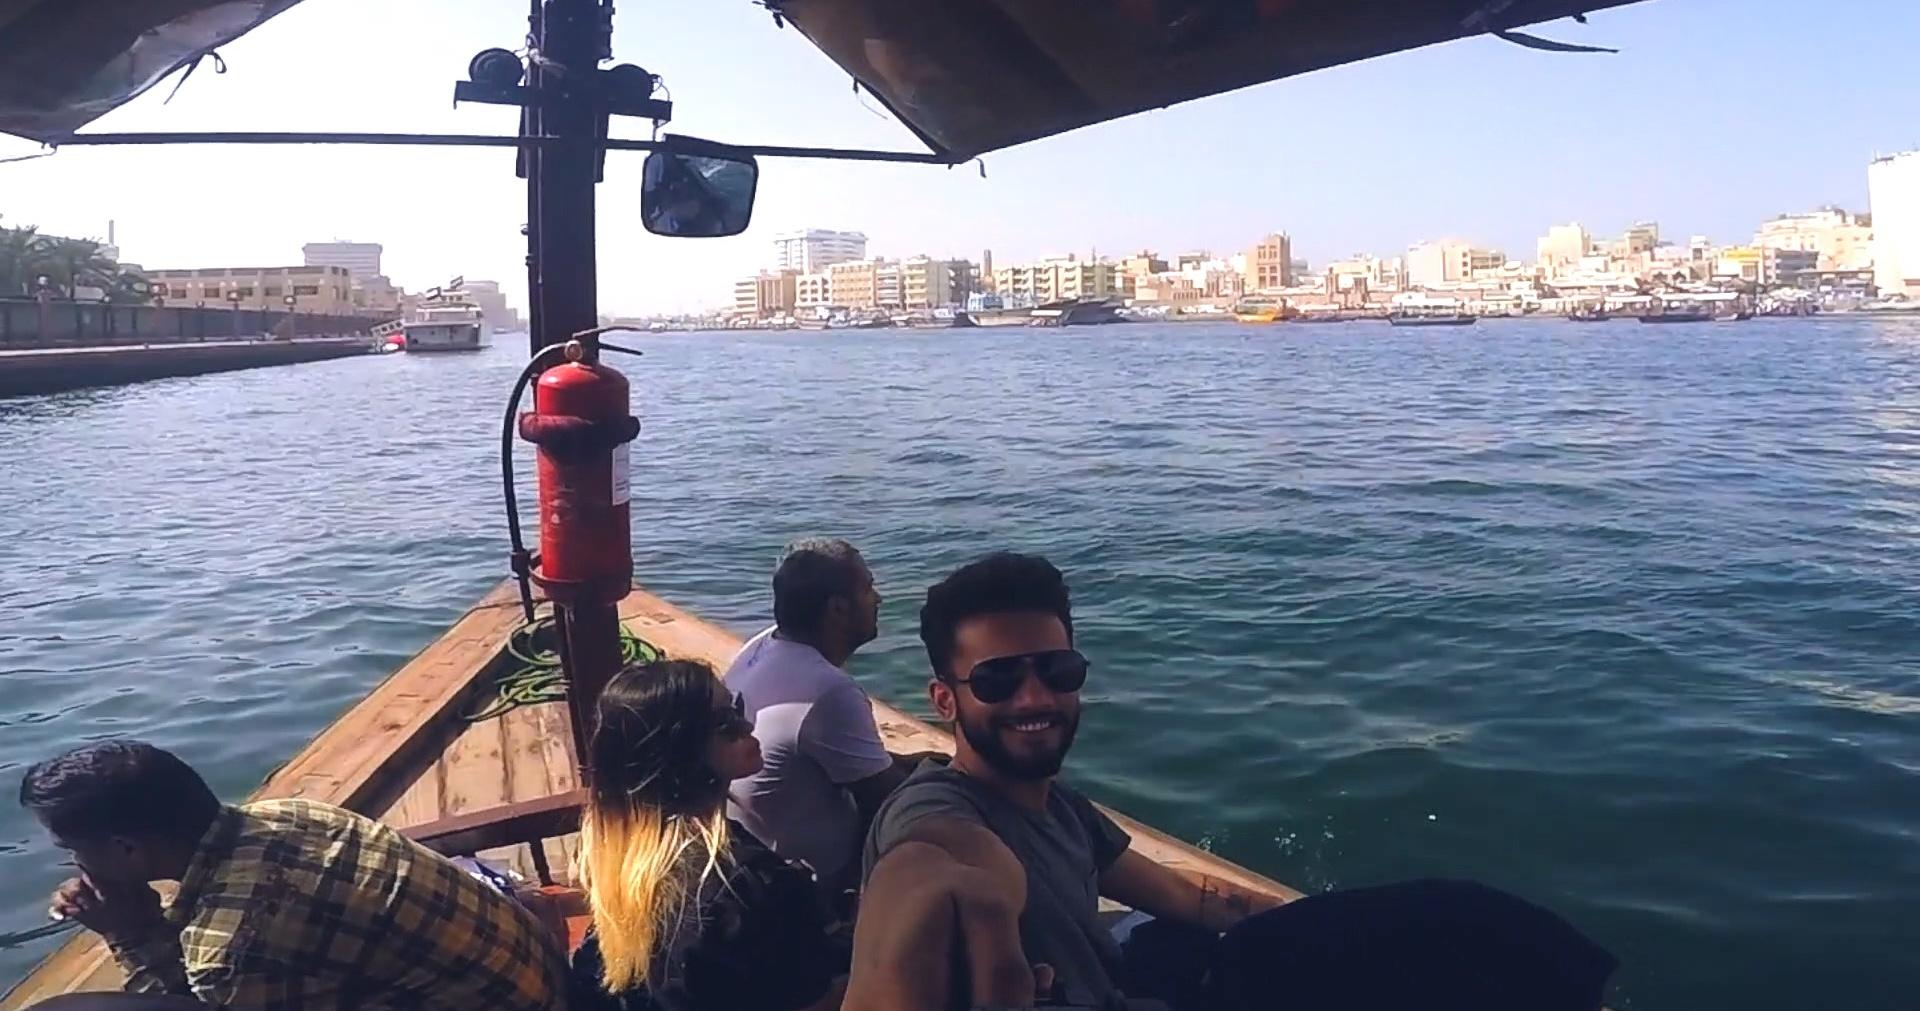 Explore Old Dubai on The Dubai Abra For Just AED 1 | insydo